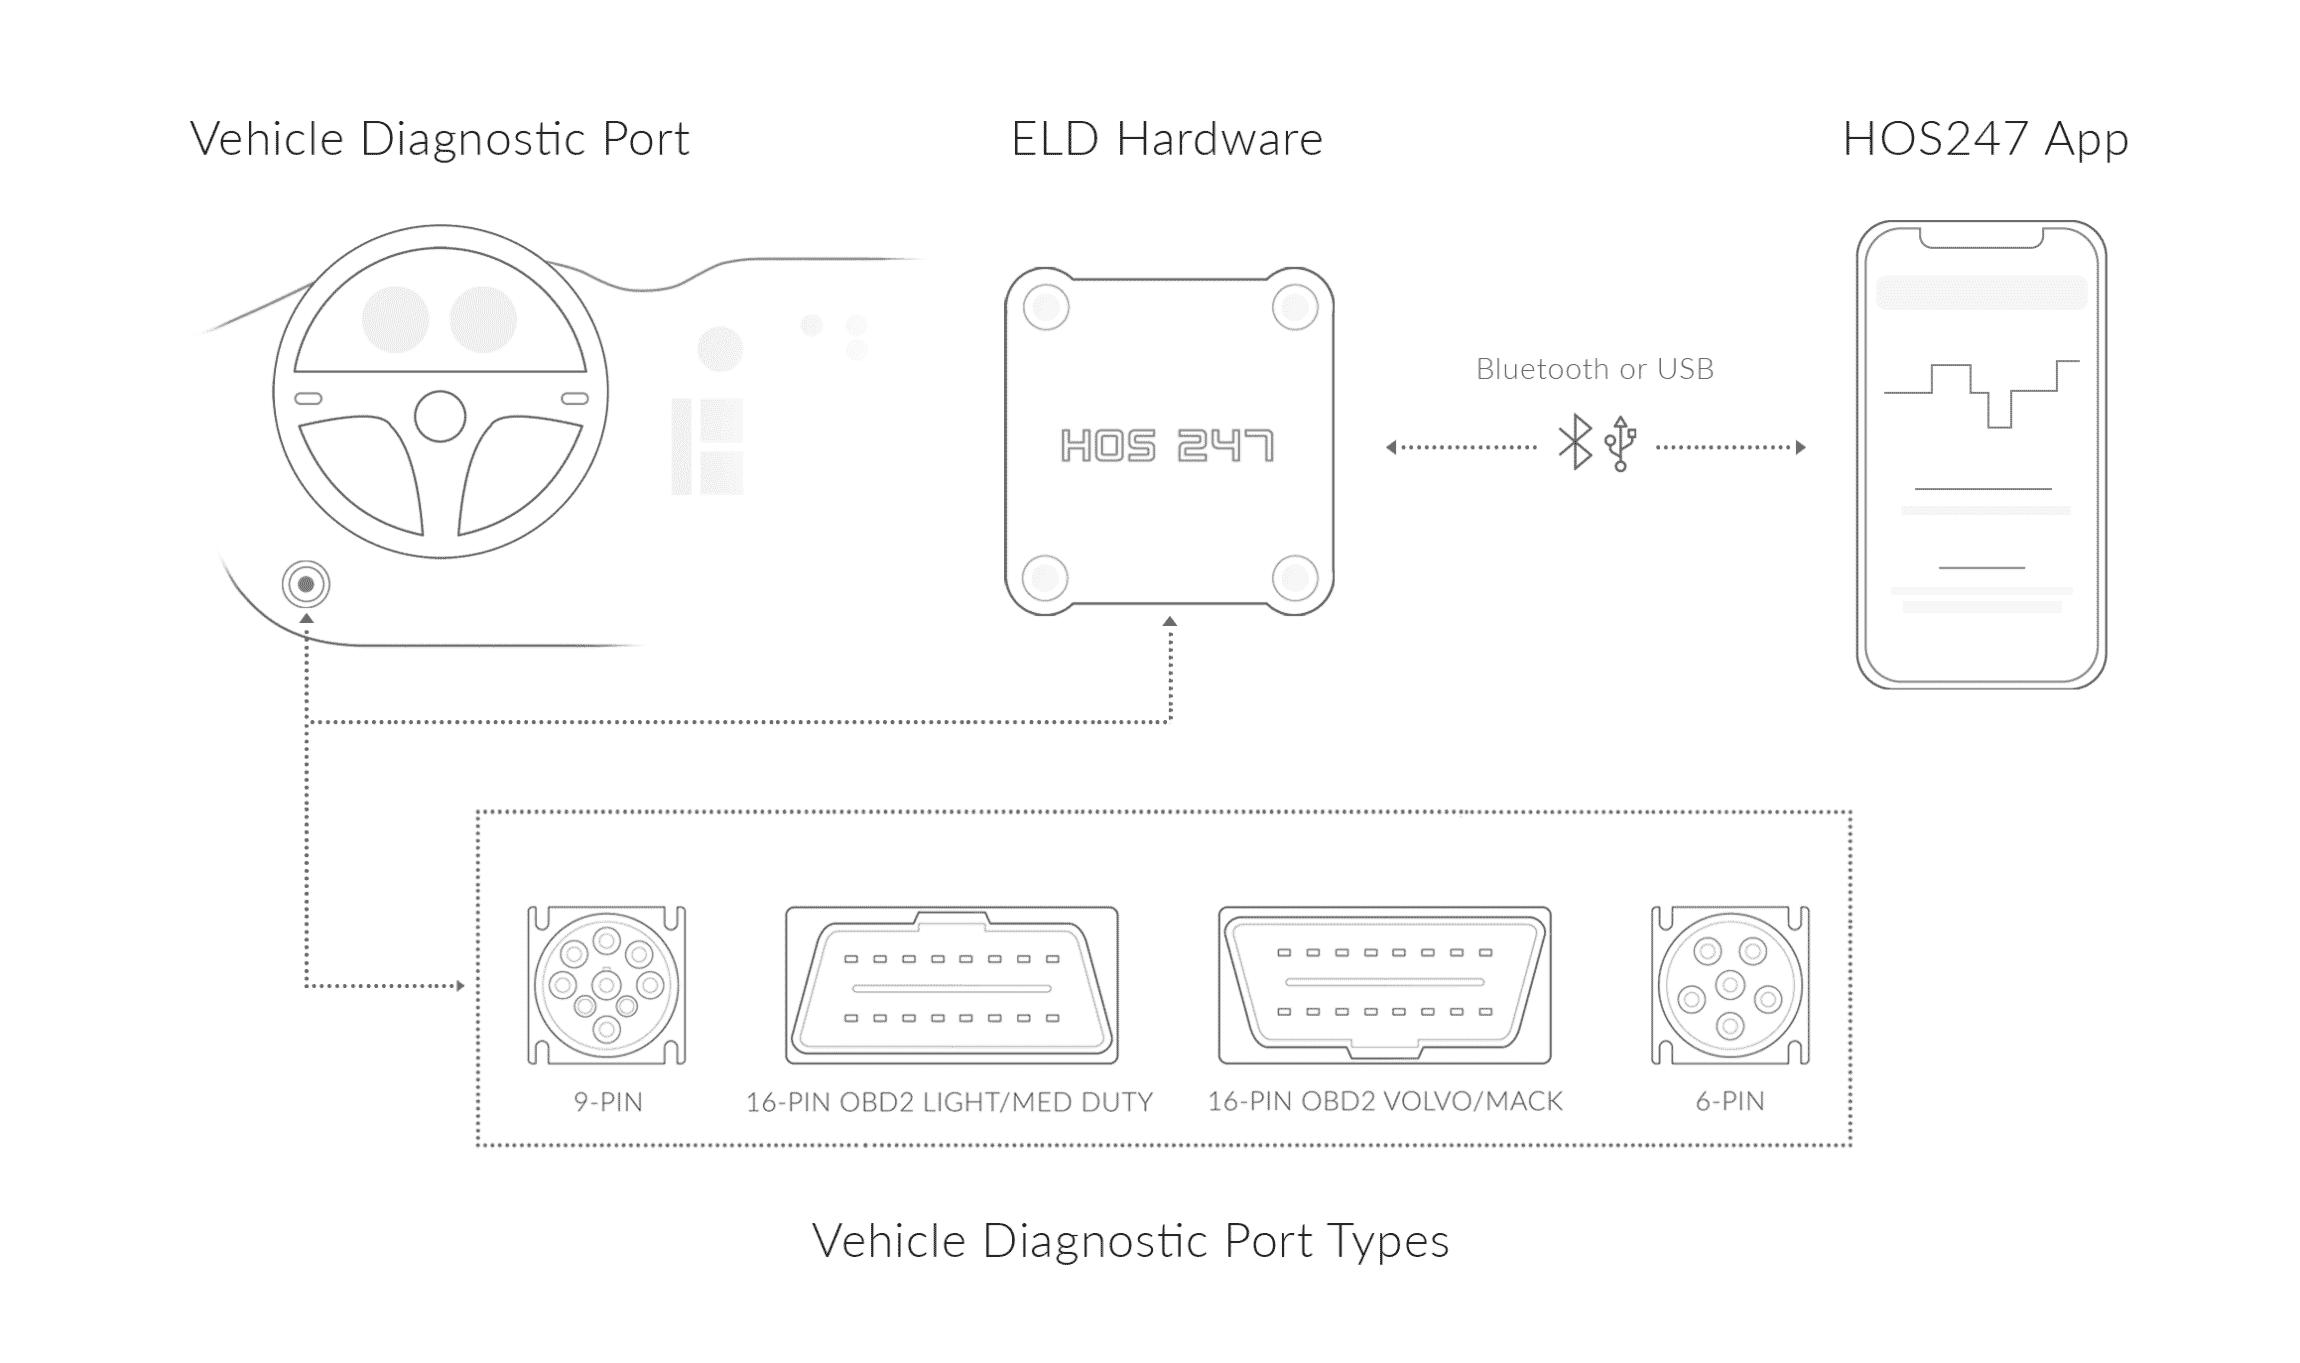 HOS247 eld connection scheme